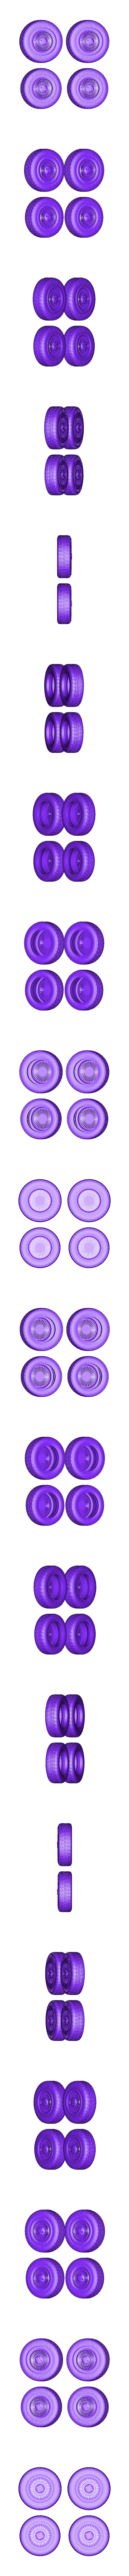 tires_trans.stl Download free STL file DIY DeLorean Time Machine with lights!! • 3D printer model, OneIdMONstr